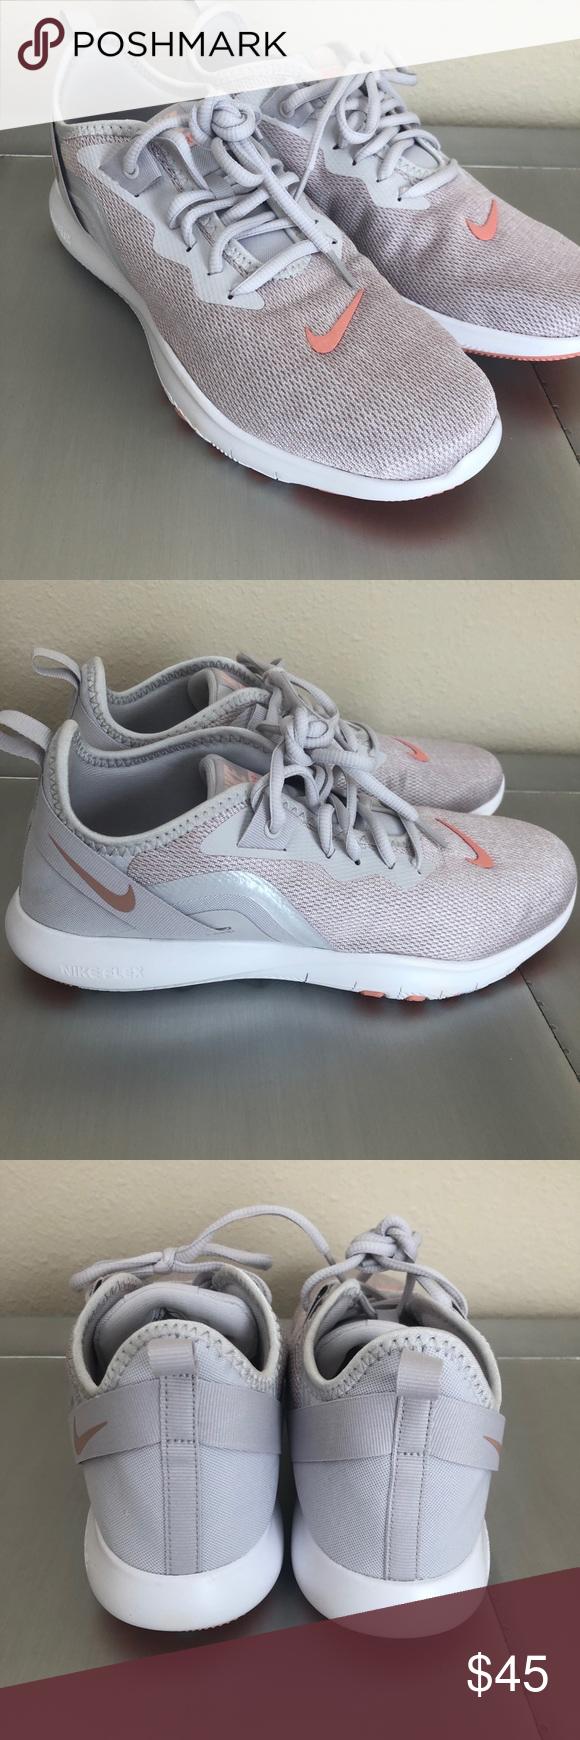 Flex Trainer 9 Sneakers SIZE